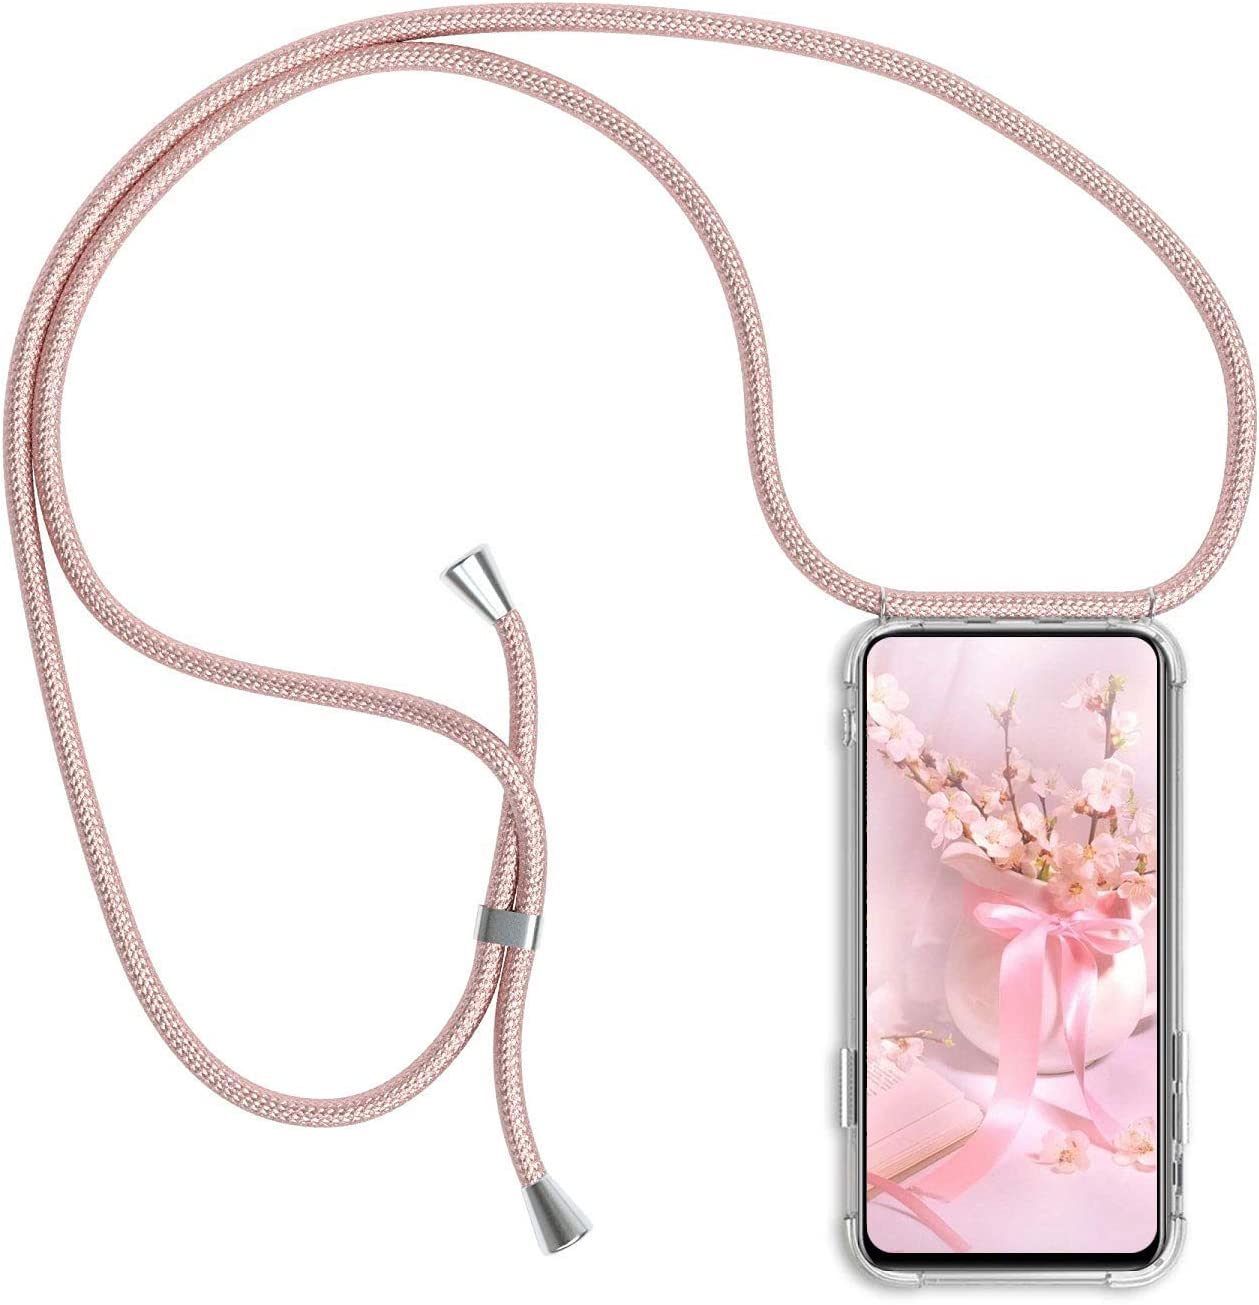 Funda con Cuerda para Xiaomi Redmi Note 7 / Note 7 Pro Silicona Transparente, Ultrafina Suave TPU Carcasa de movil con Colgante [Moda y Practico] [Anti-rasguños Anti-Choque] - Oro Rosa